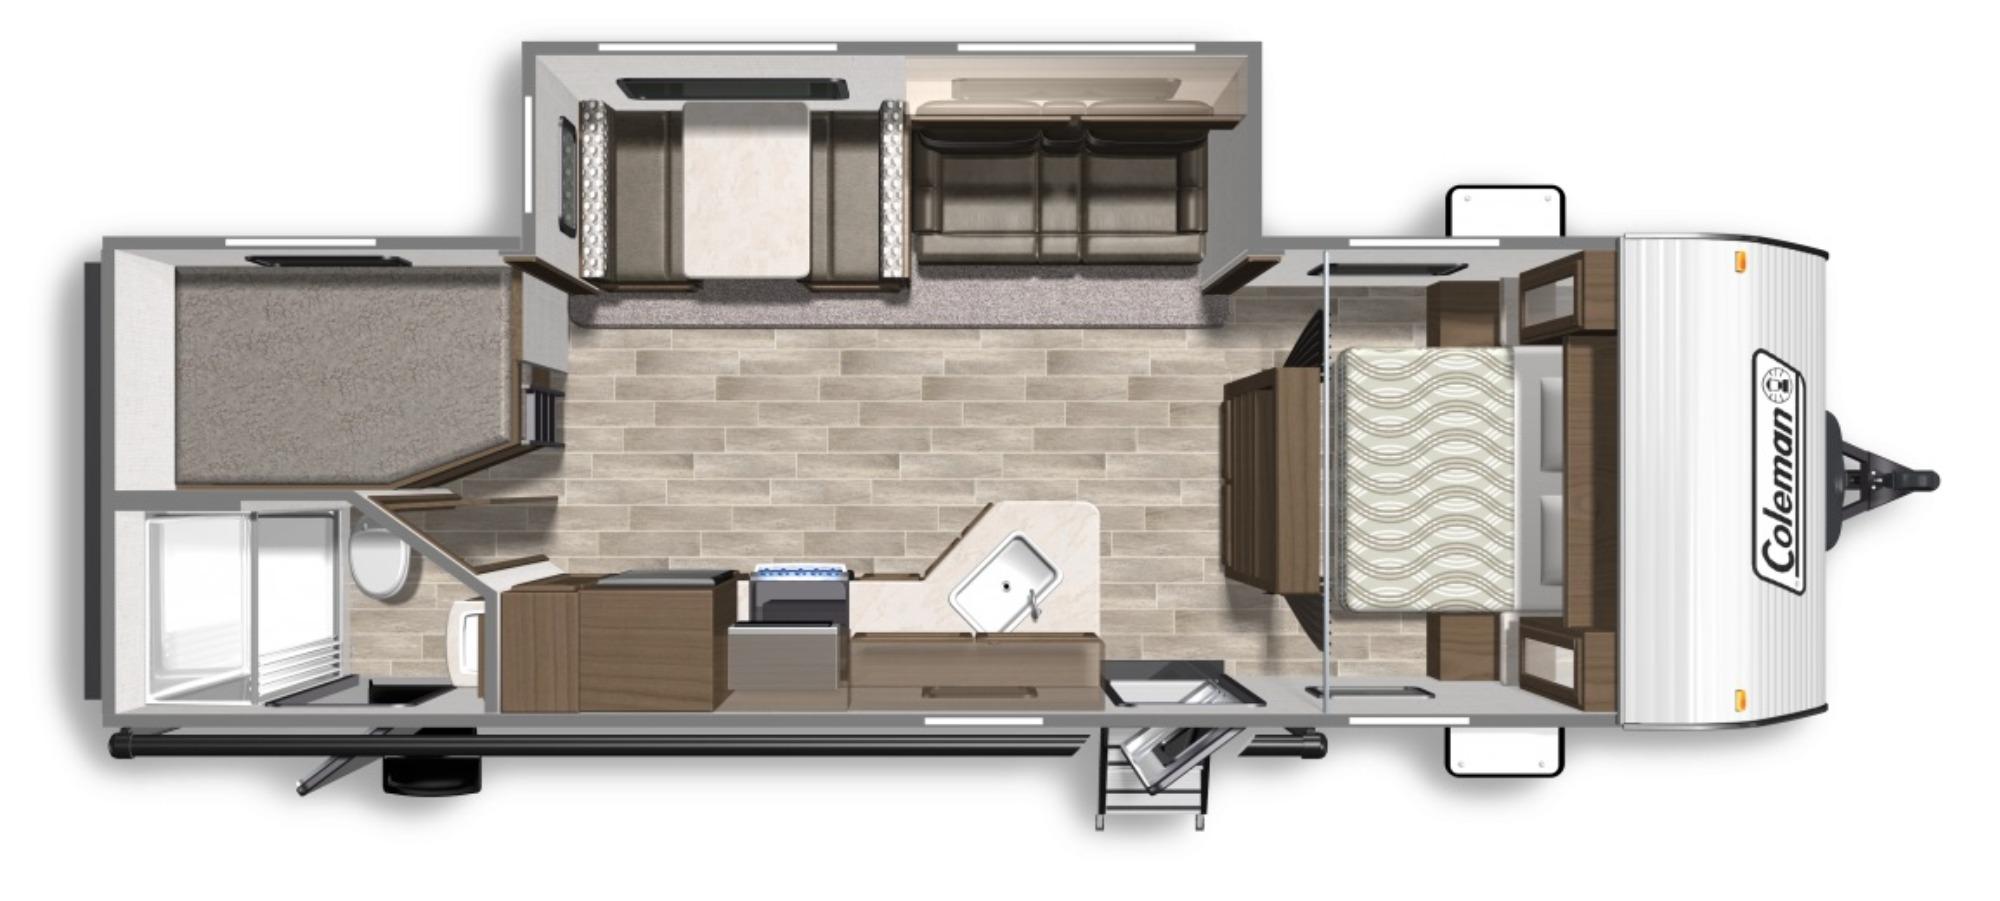 View Floor Plan for 2020 COLEMAN COLEMAN LANTERN 263BHWE